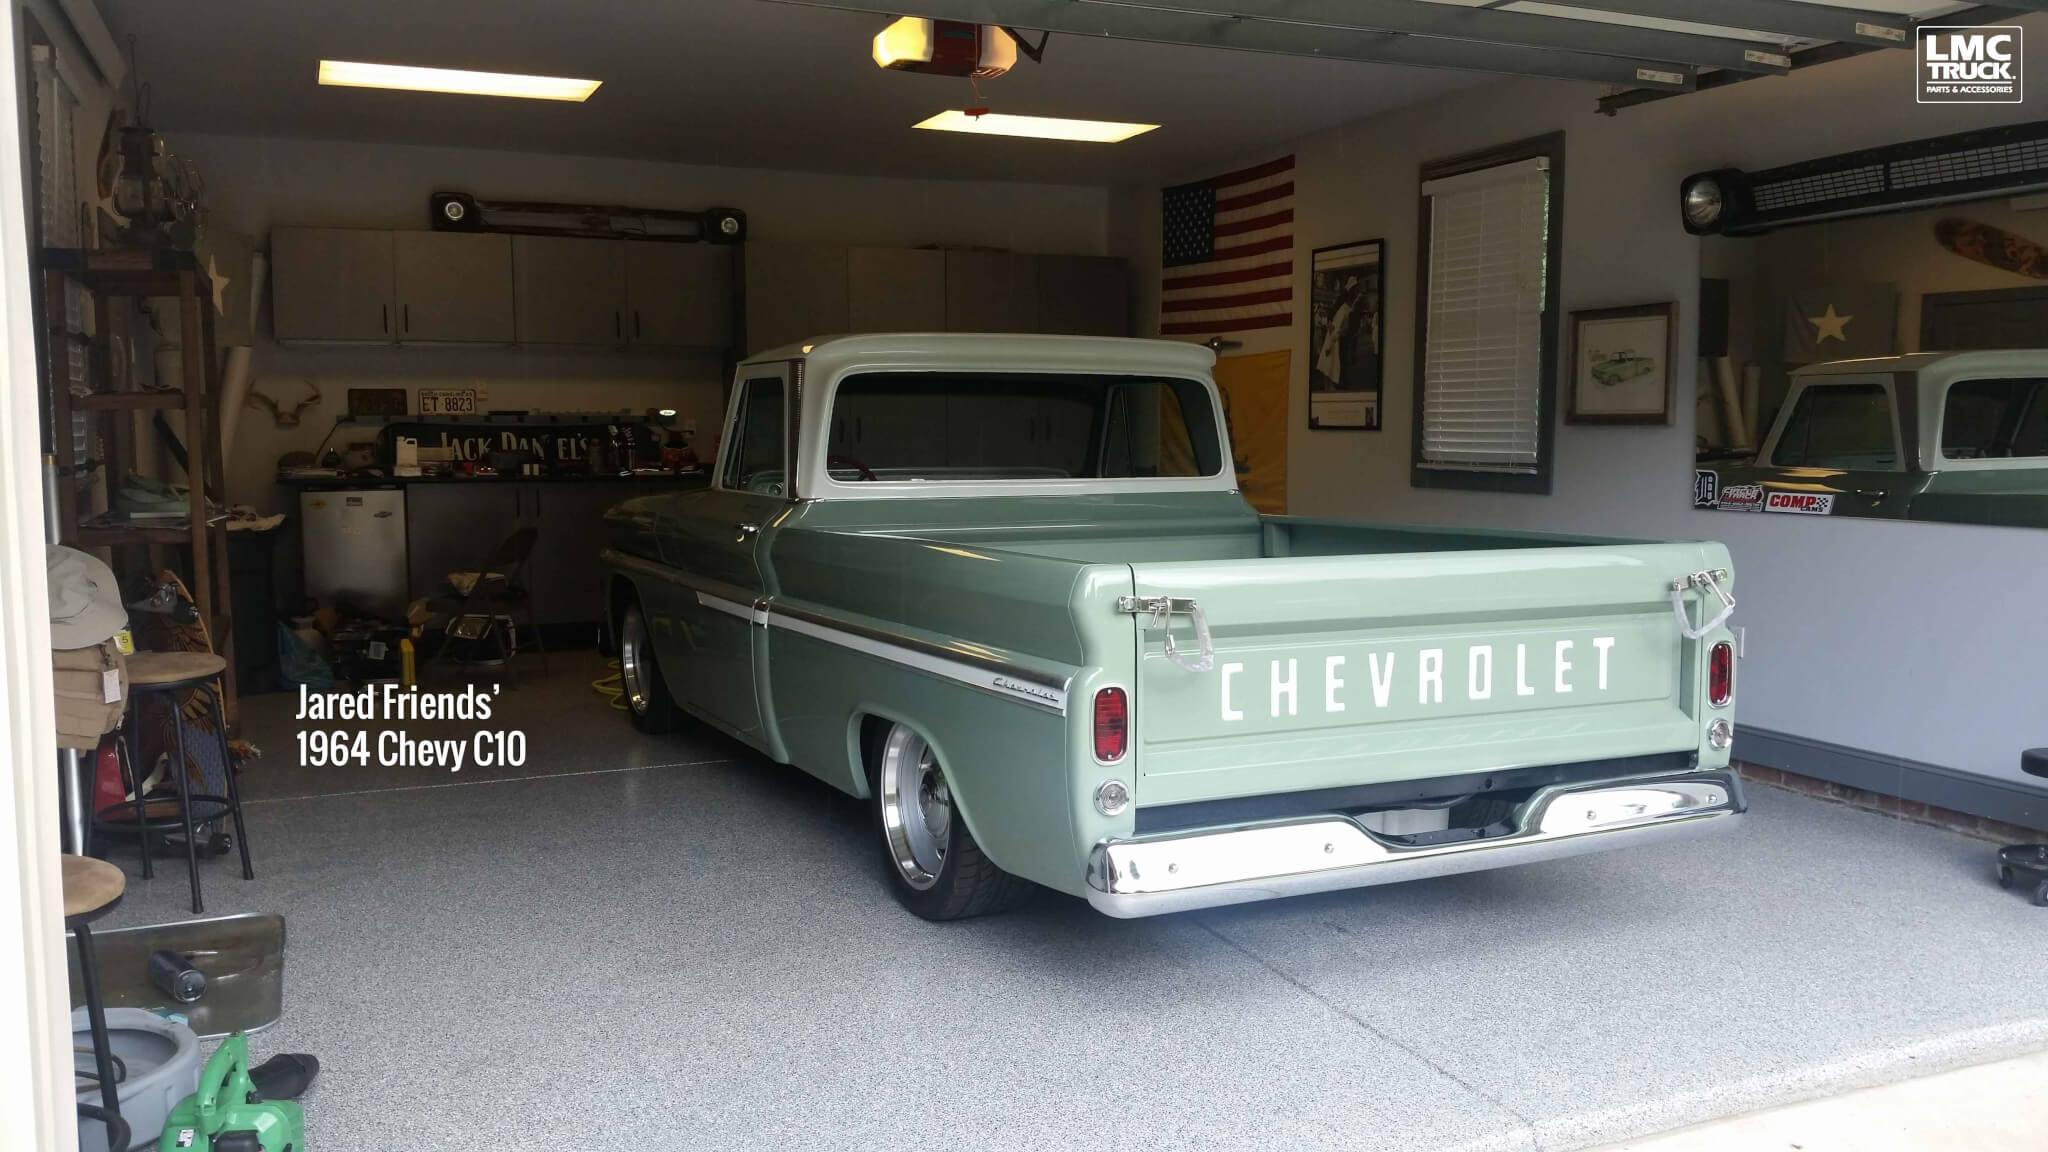 1964 Chevy C10-Jared F  - LMC Truck Life